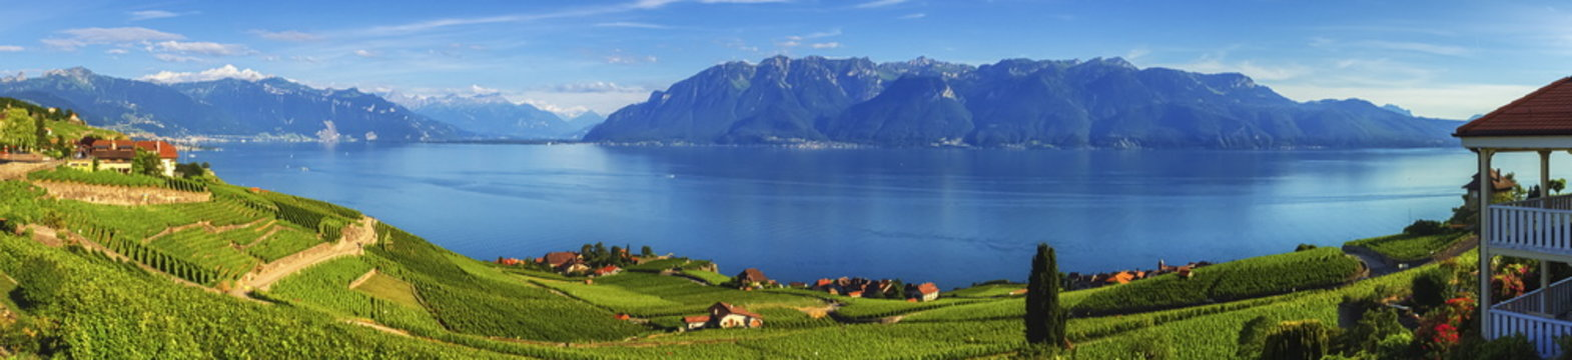 Panorama on Lavaux region, Vaud, Switzerland